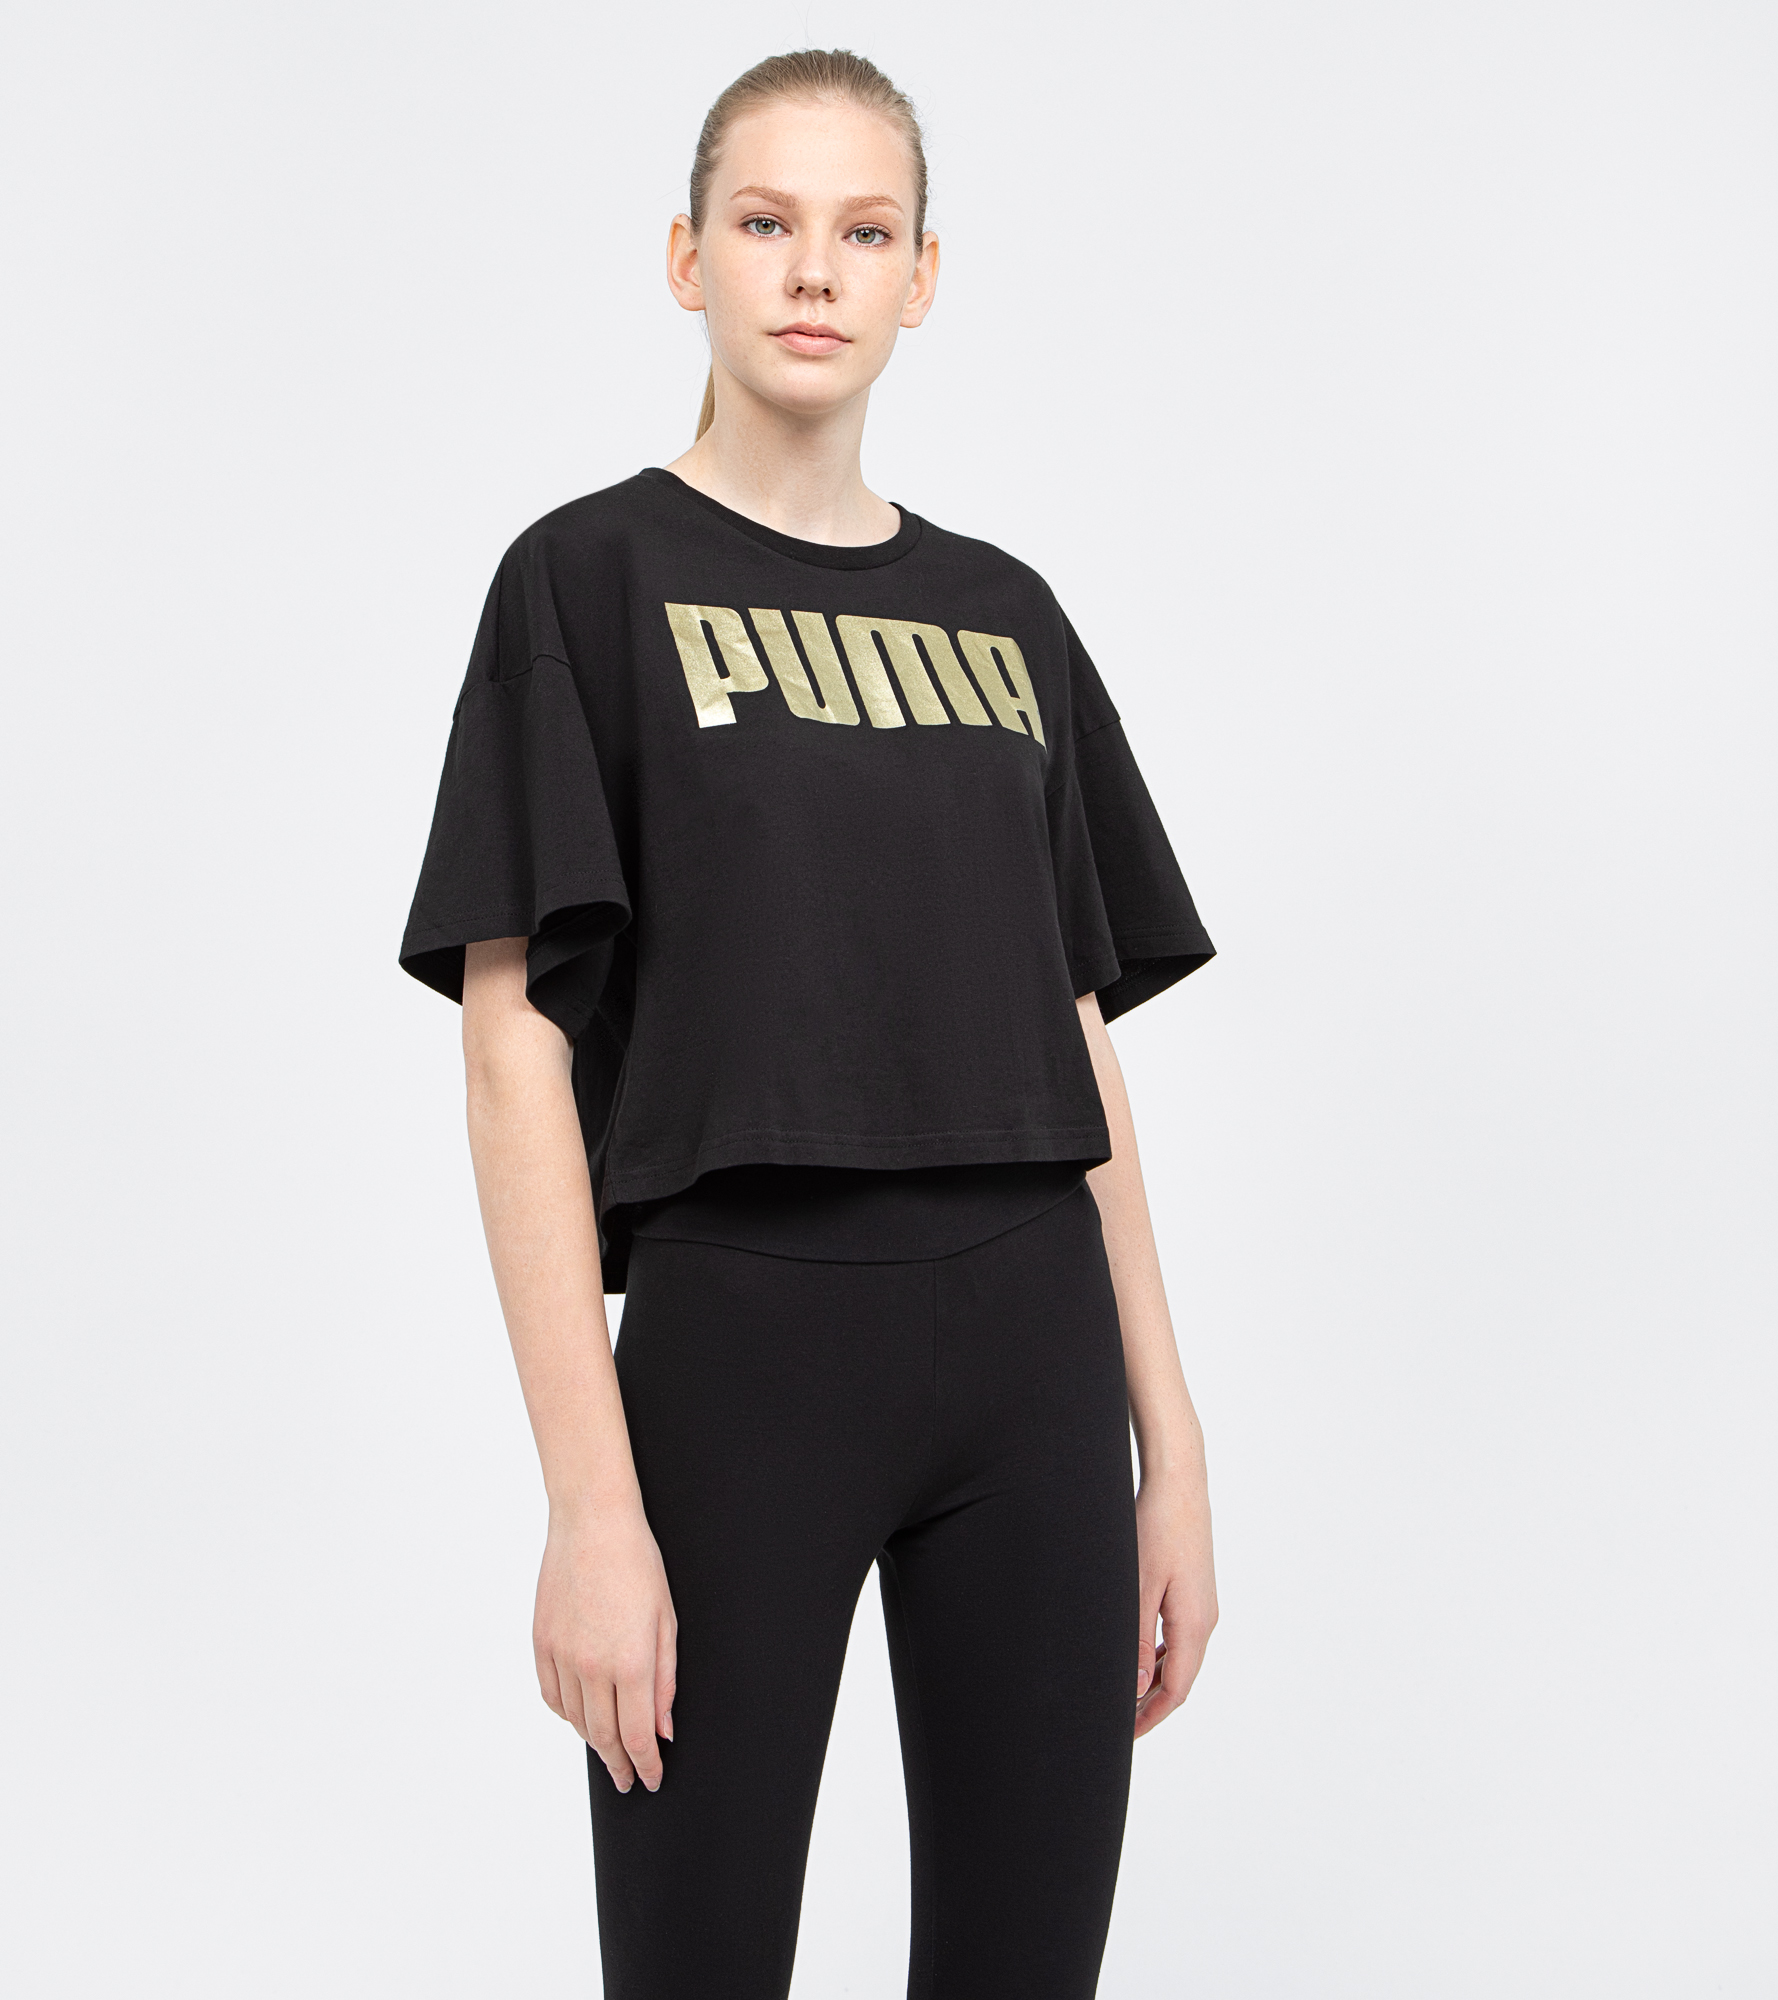 Puma Футболка женская Puma Rebel Fashion Tee, размер 44-46 футболка мужская puma basic 2p crew tee цвет черный 2 шт 90668901 размер s 44 46